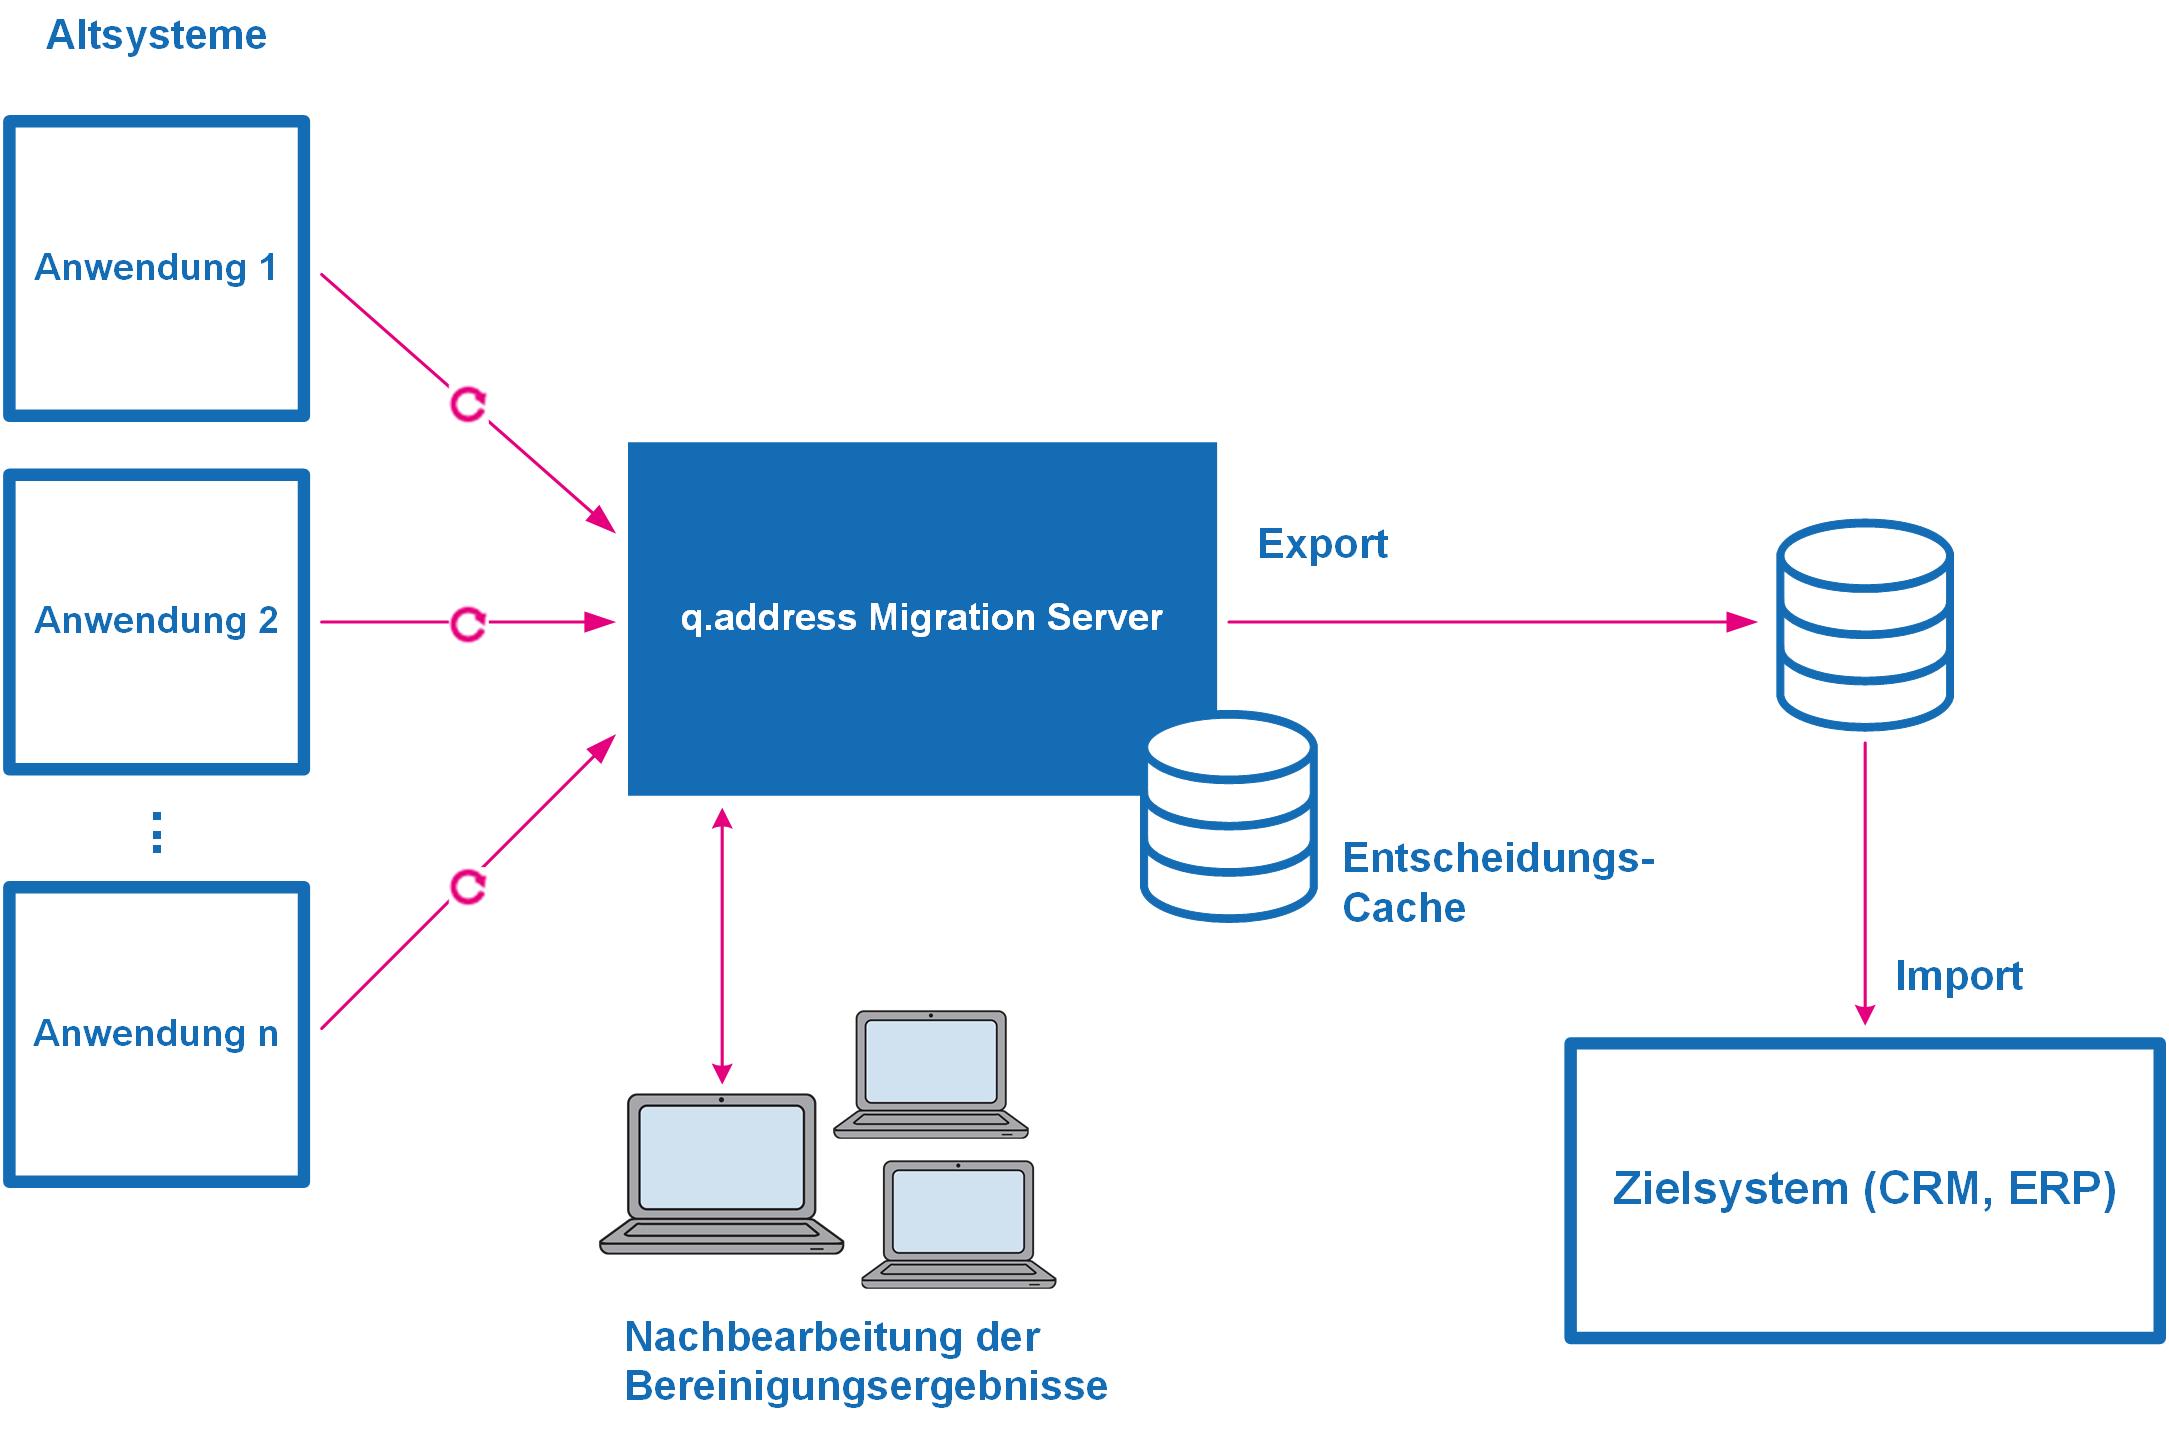 q.address Migration Server